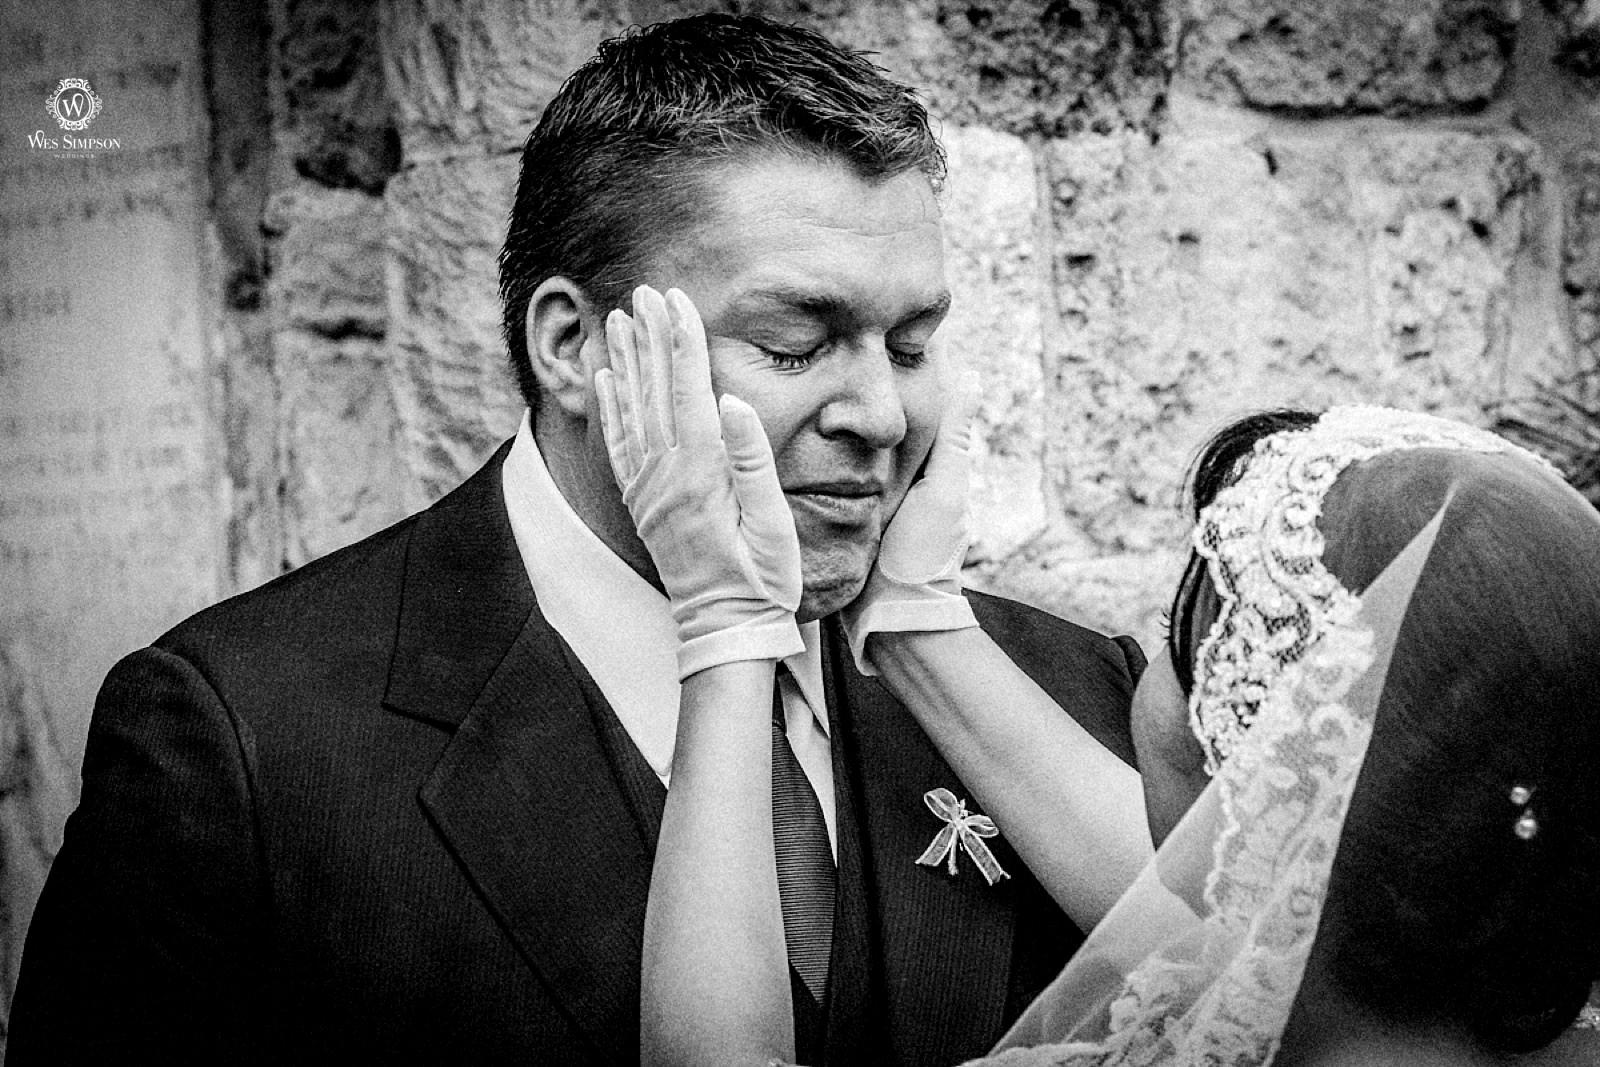 Destination wedding photographer wes simpson